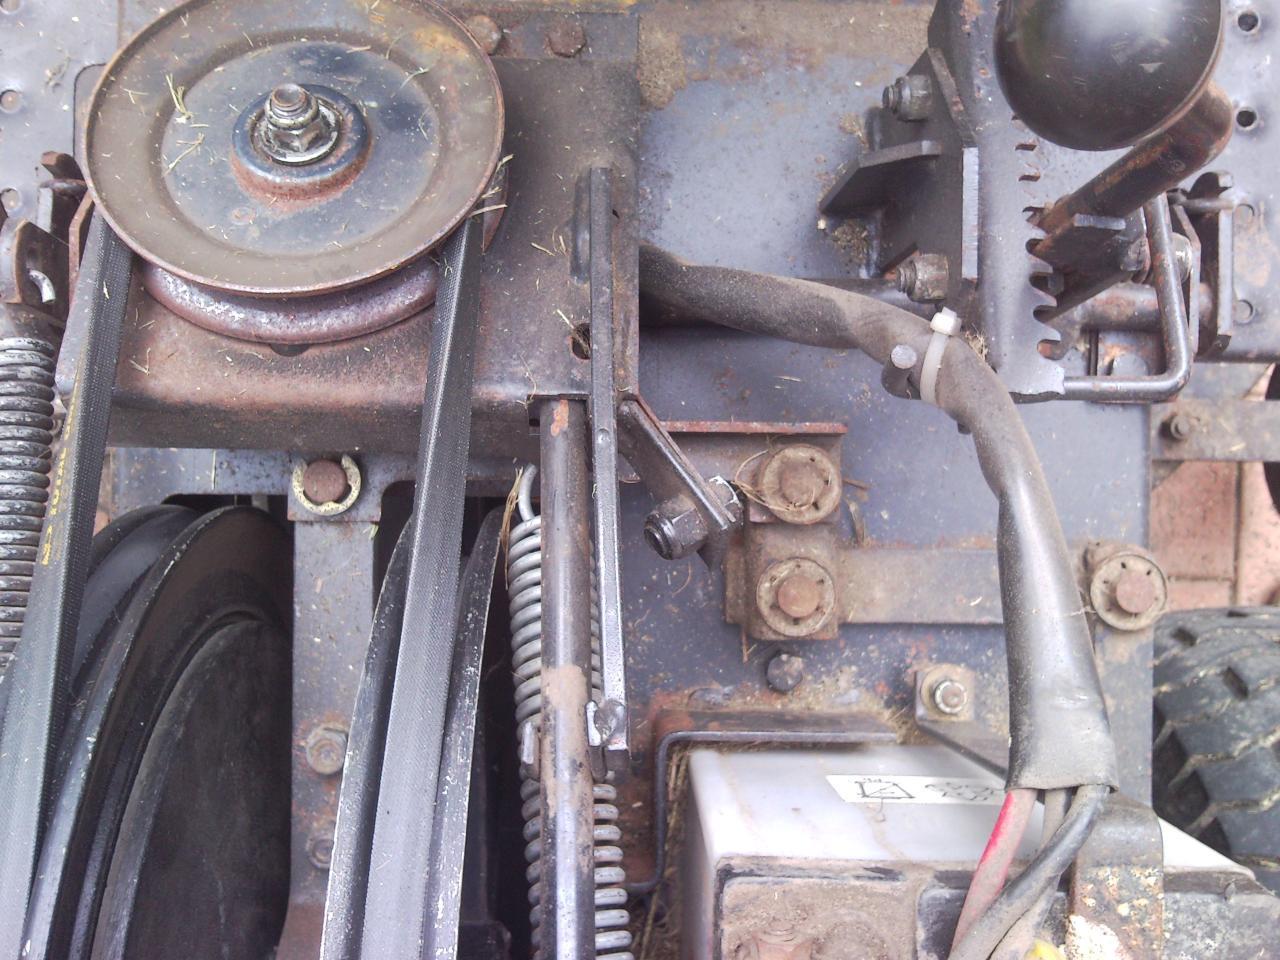 Greenfield Evolution 13/32 - Rolled Drive Belt - OutdoorKing Repair Forum